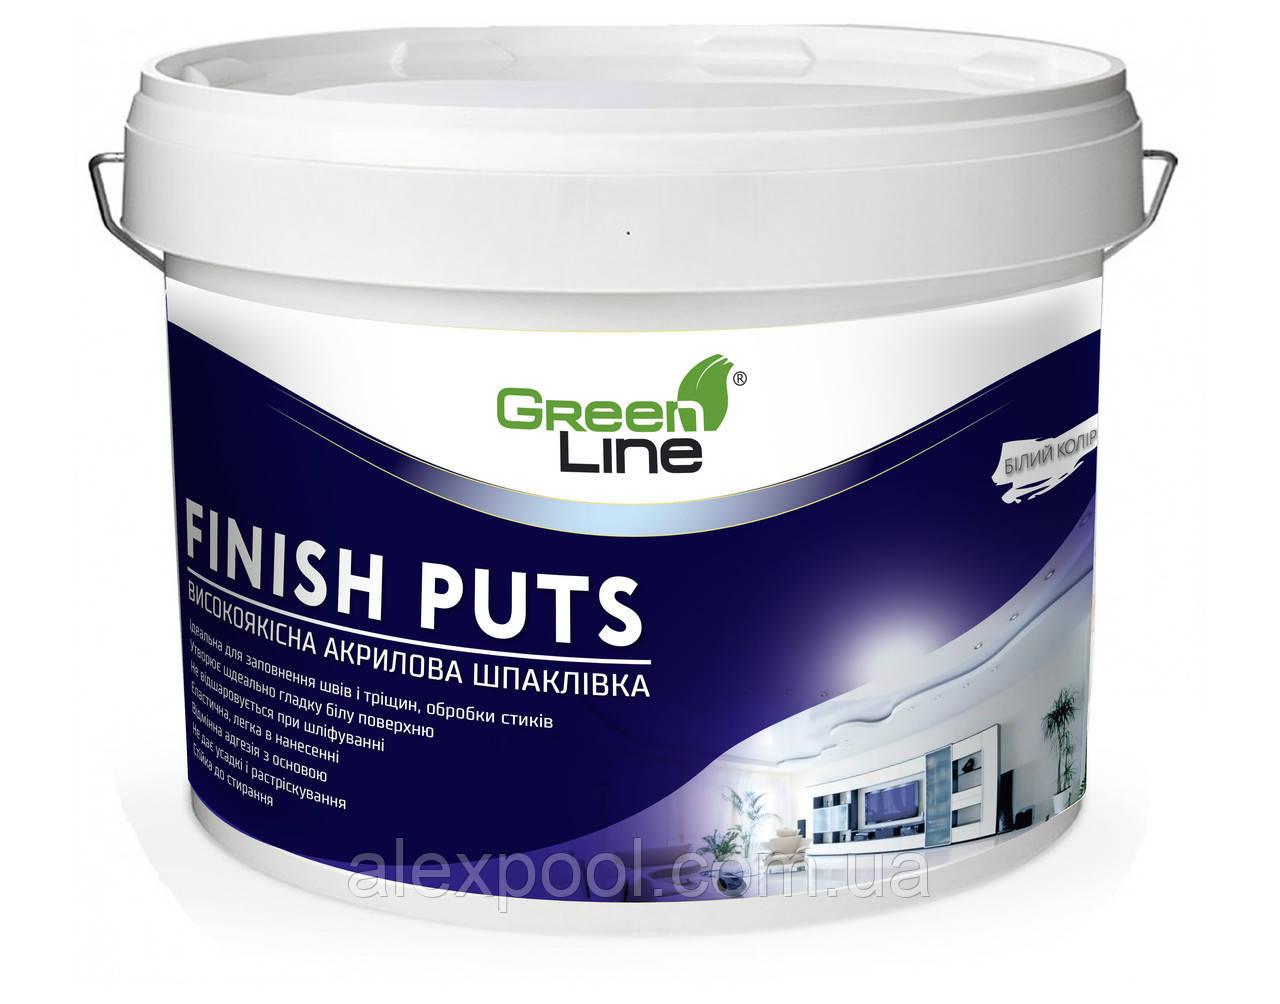 Фінішна акрилова шпаклівка TM Green Line FINISH PUTS 20 л